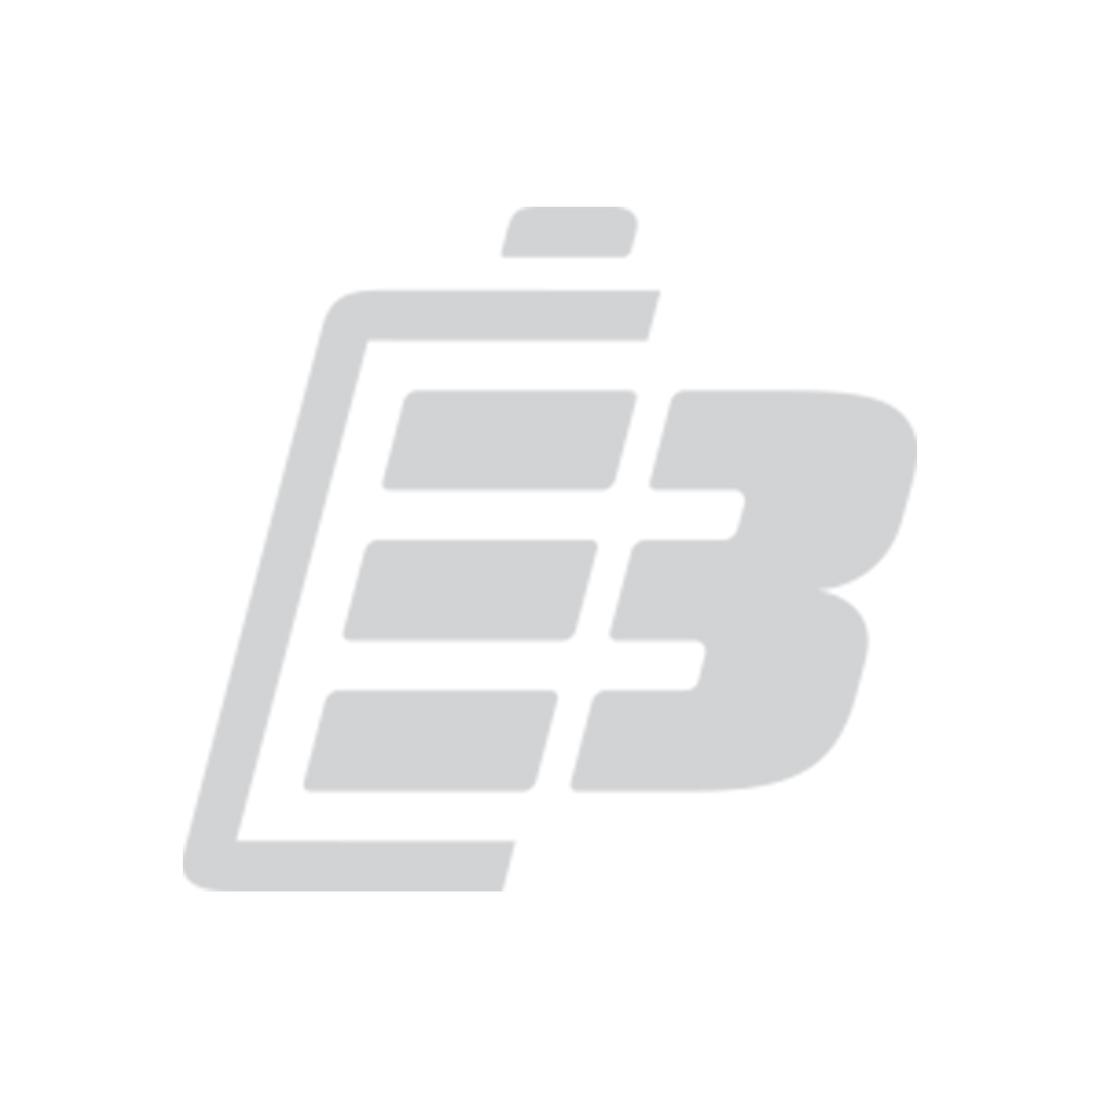 Mobile phone battery Nokia 7210 Supernova_1